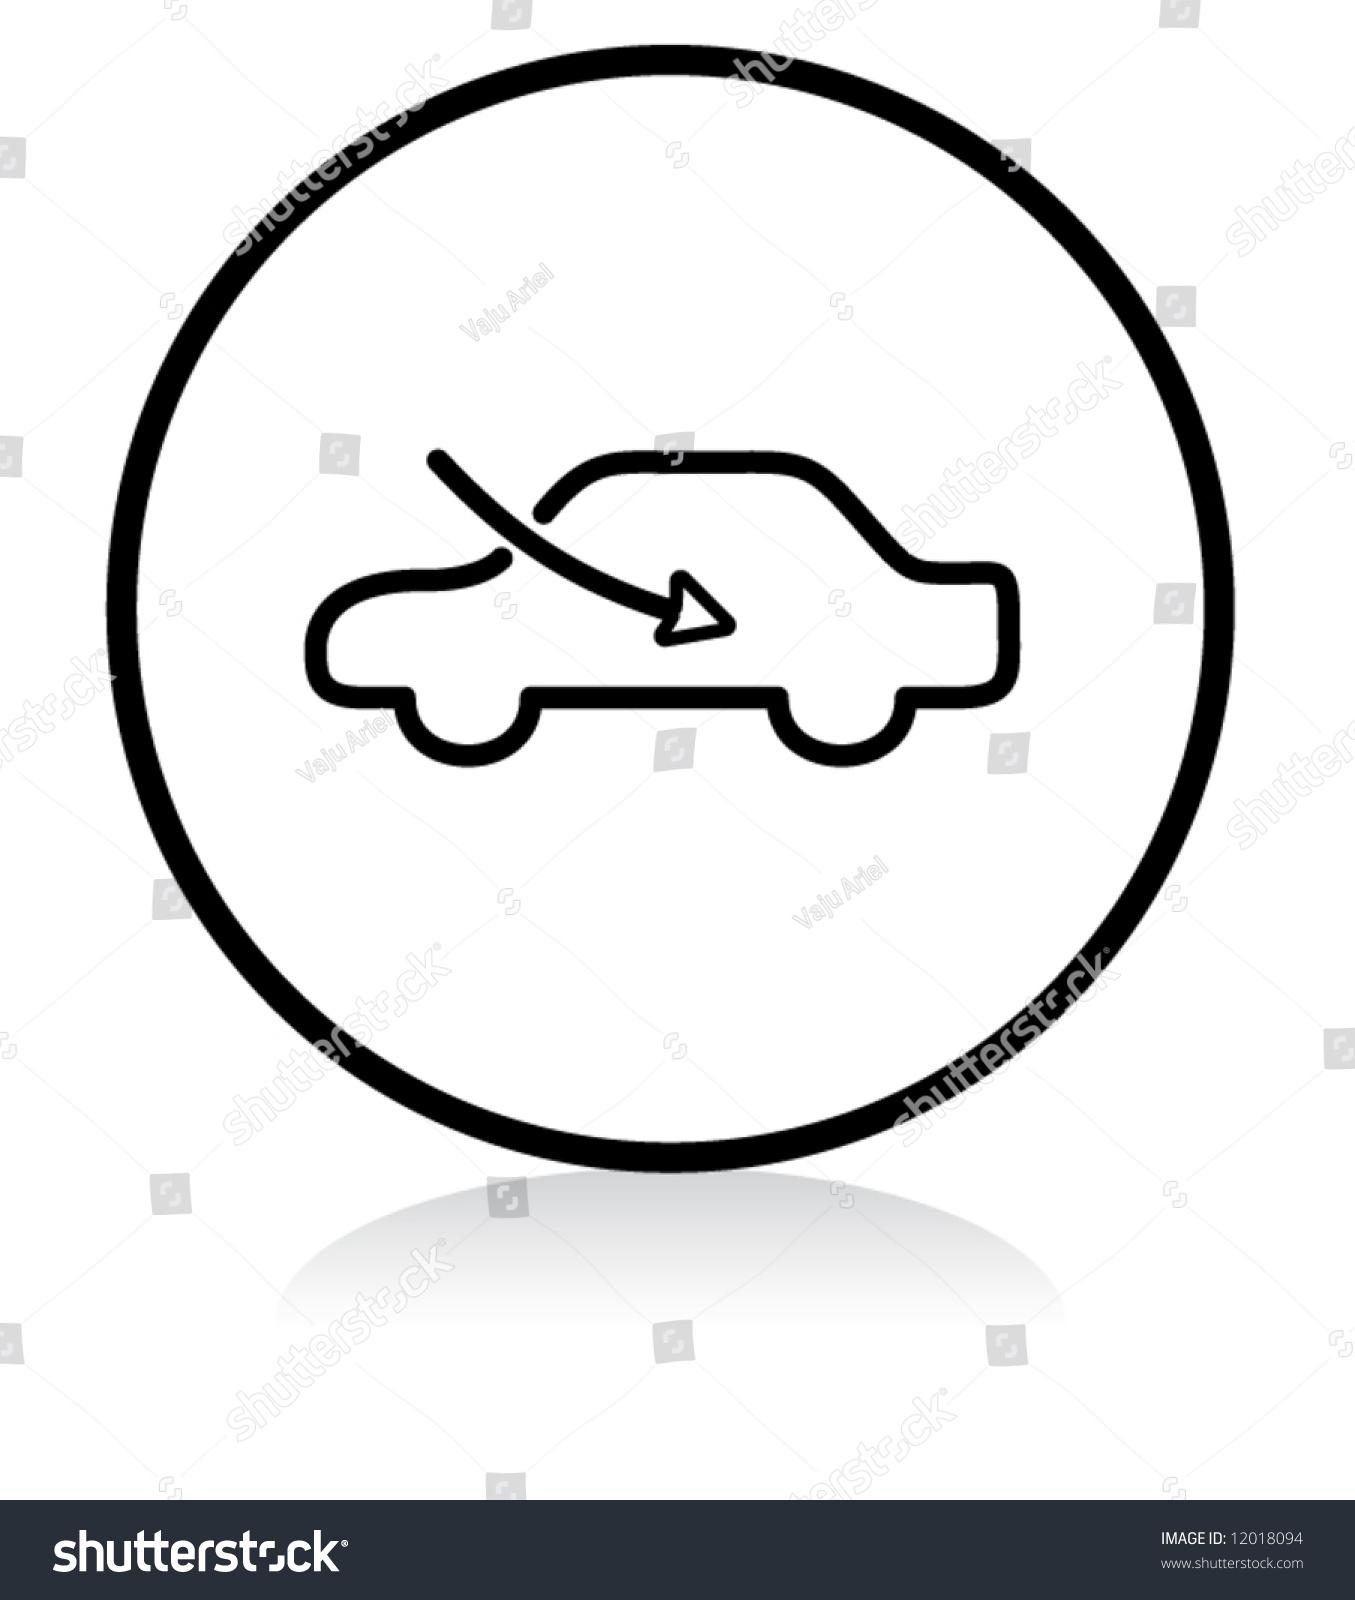 hight resolution of car airflow button symbol b w version